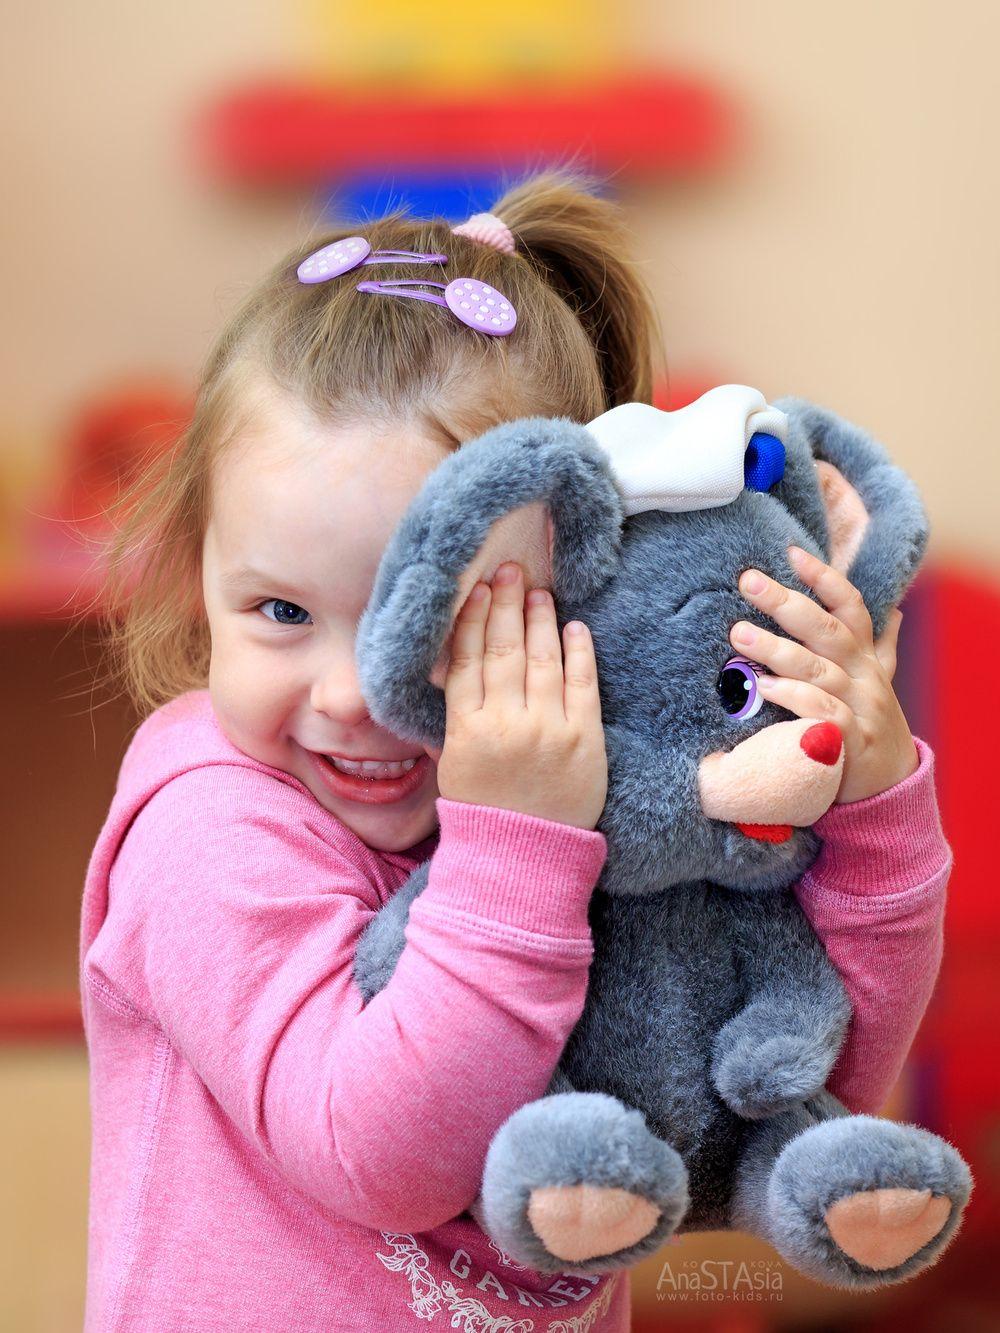 Фотосъемка в детском саду фото Москва | Детский сад фото ...